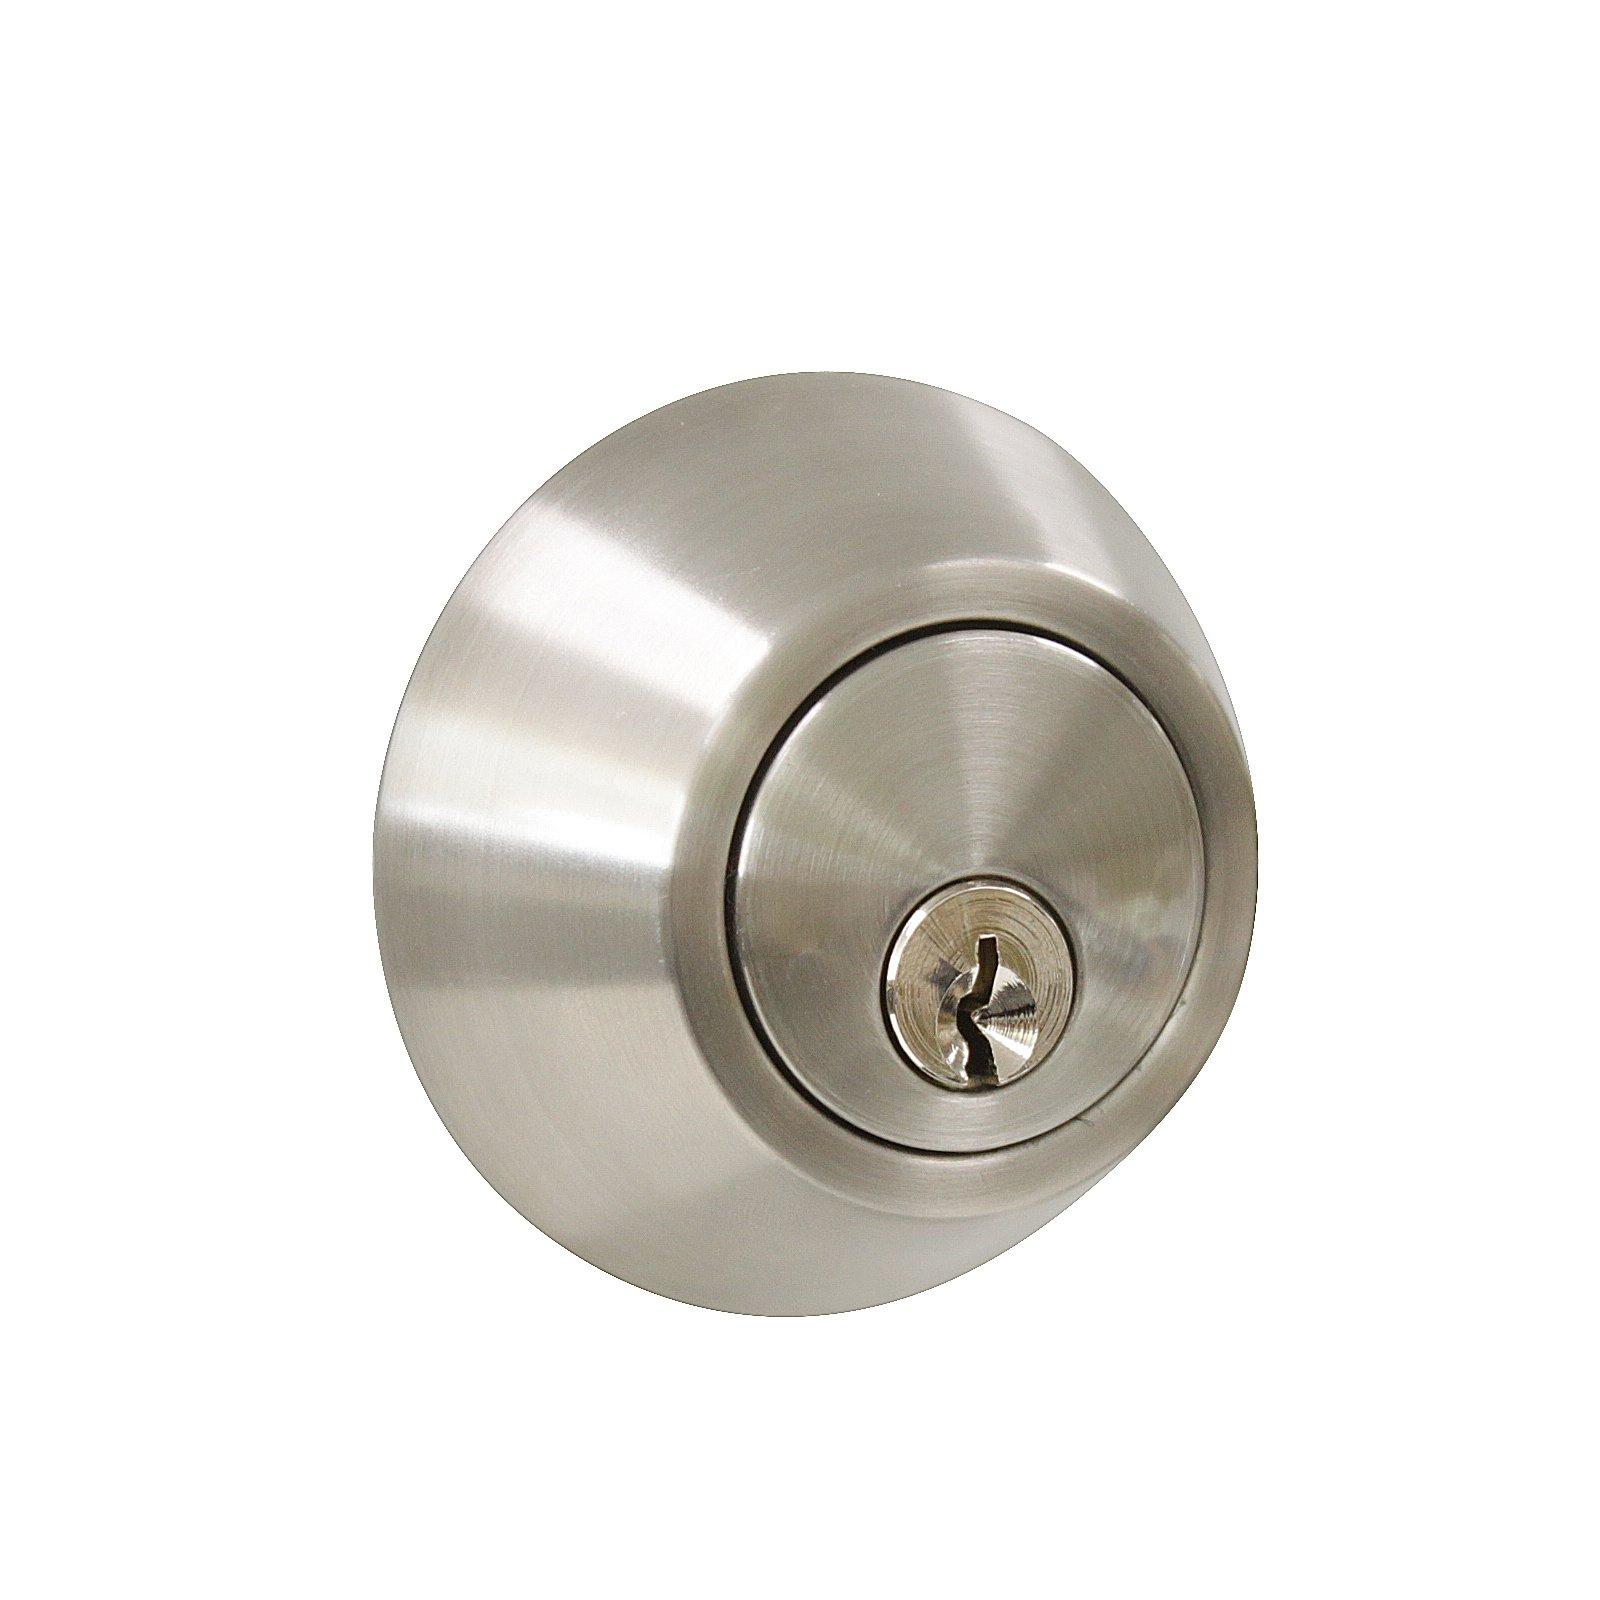 3 Pack Probrico Interior Bedroom Single Cylinder Deadbolt One Keyway Keyed Alike Same Key Safety Bolt Door Lock Lockset in Satin Nickel-Single Deadbolt-101 by Probrico (Image #5)